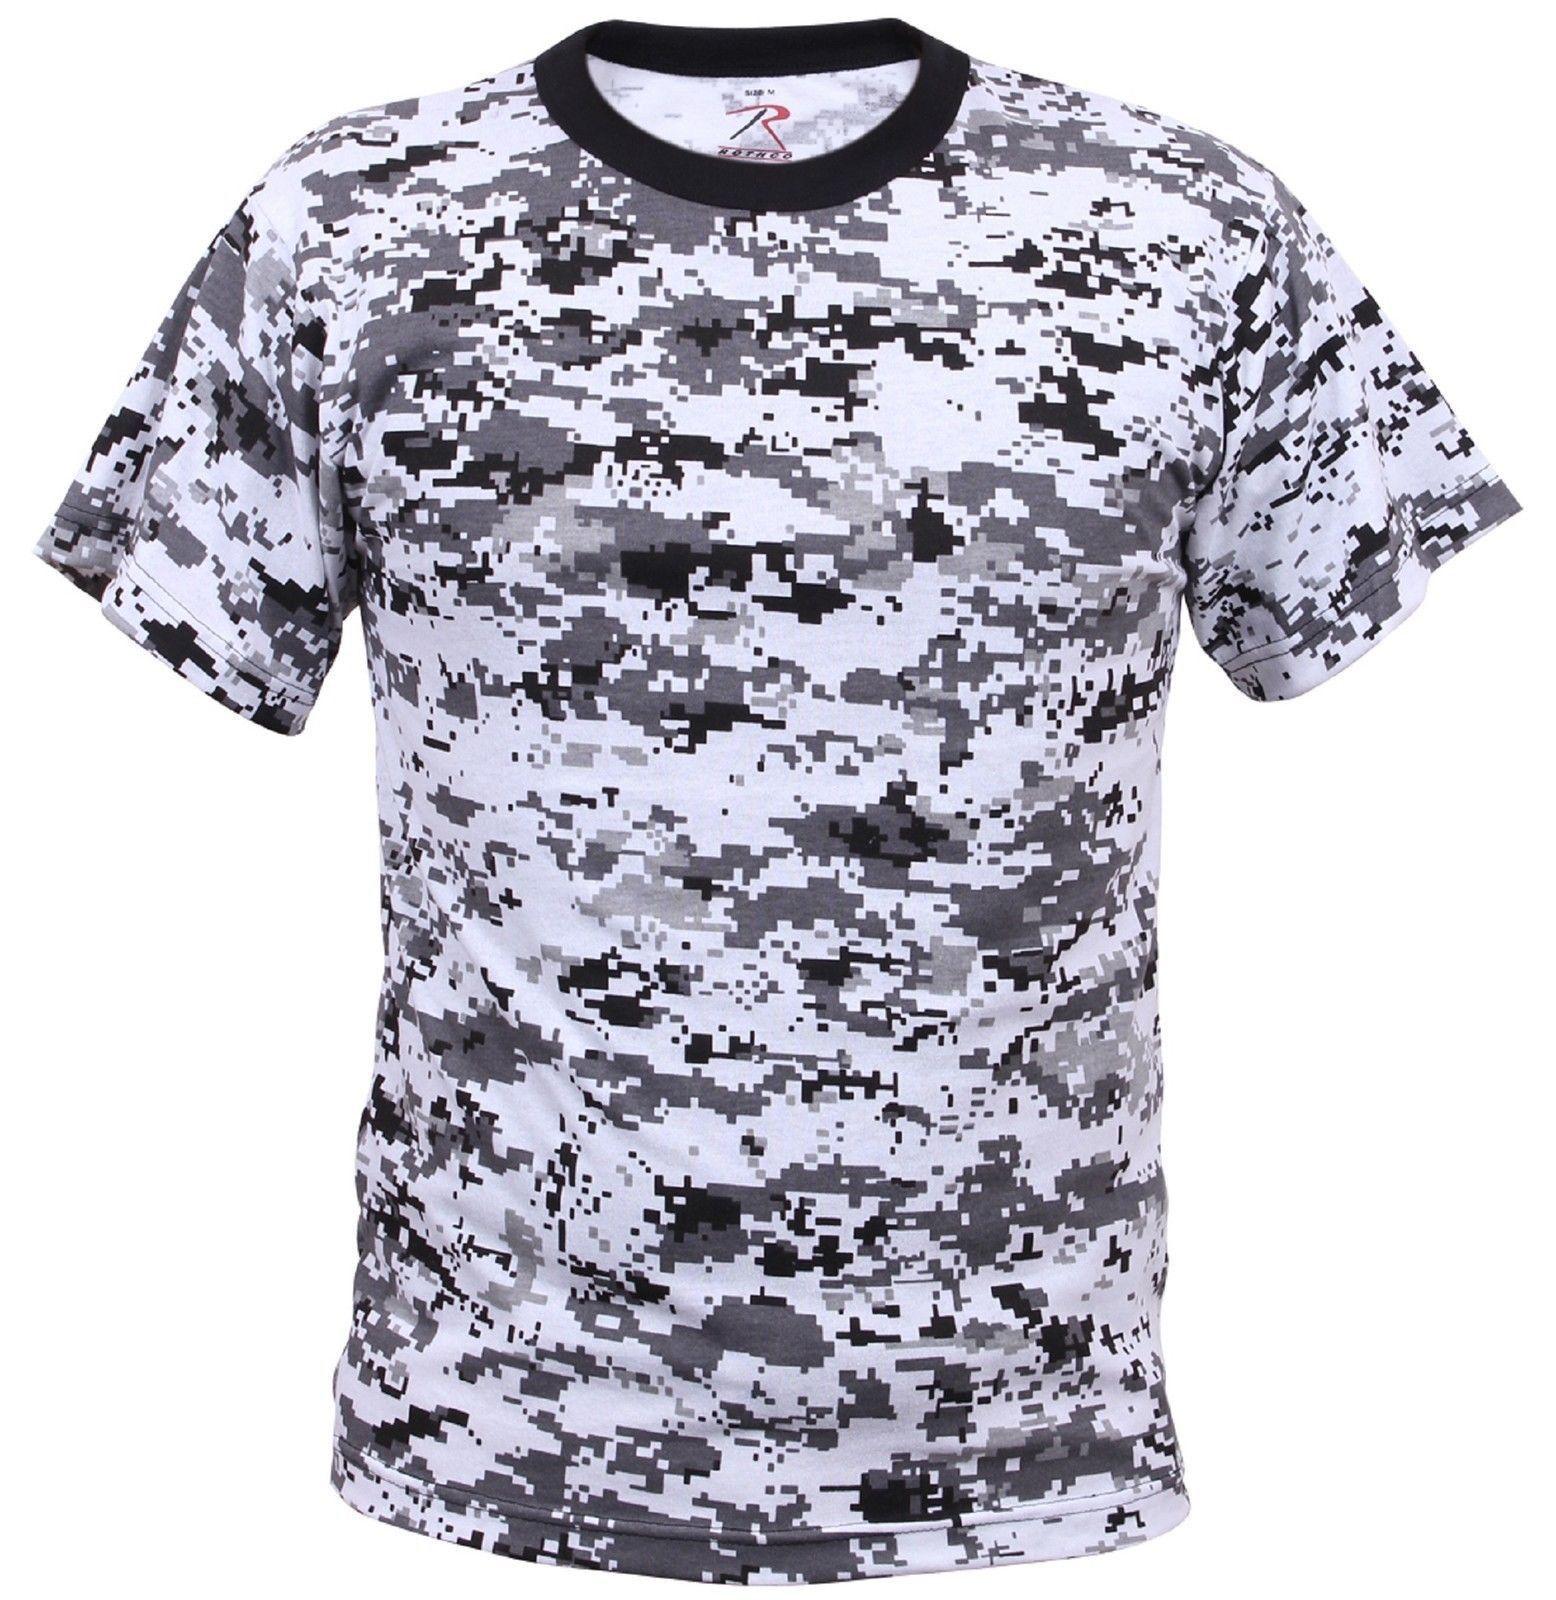 Boy's & Girl's Digital Camouflage T-Shirt - Kid's Sky Blue or City Digital Tee's